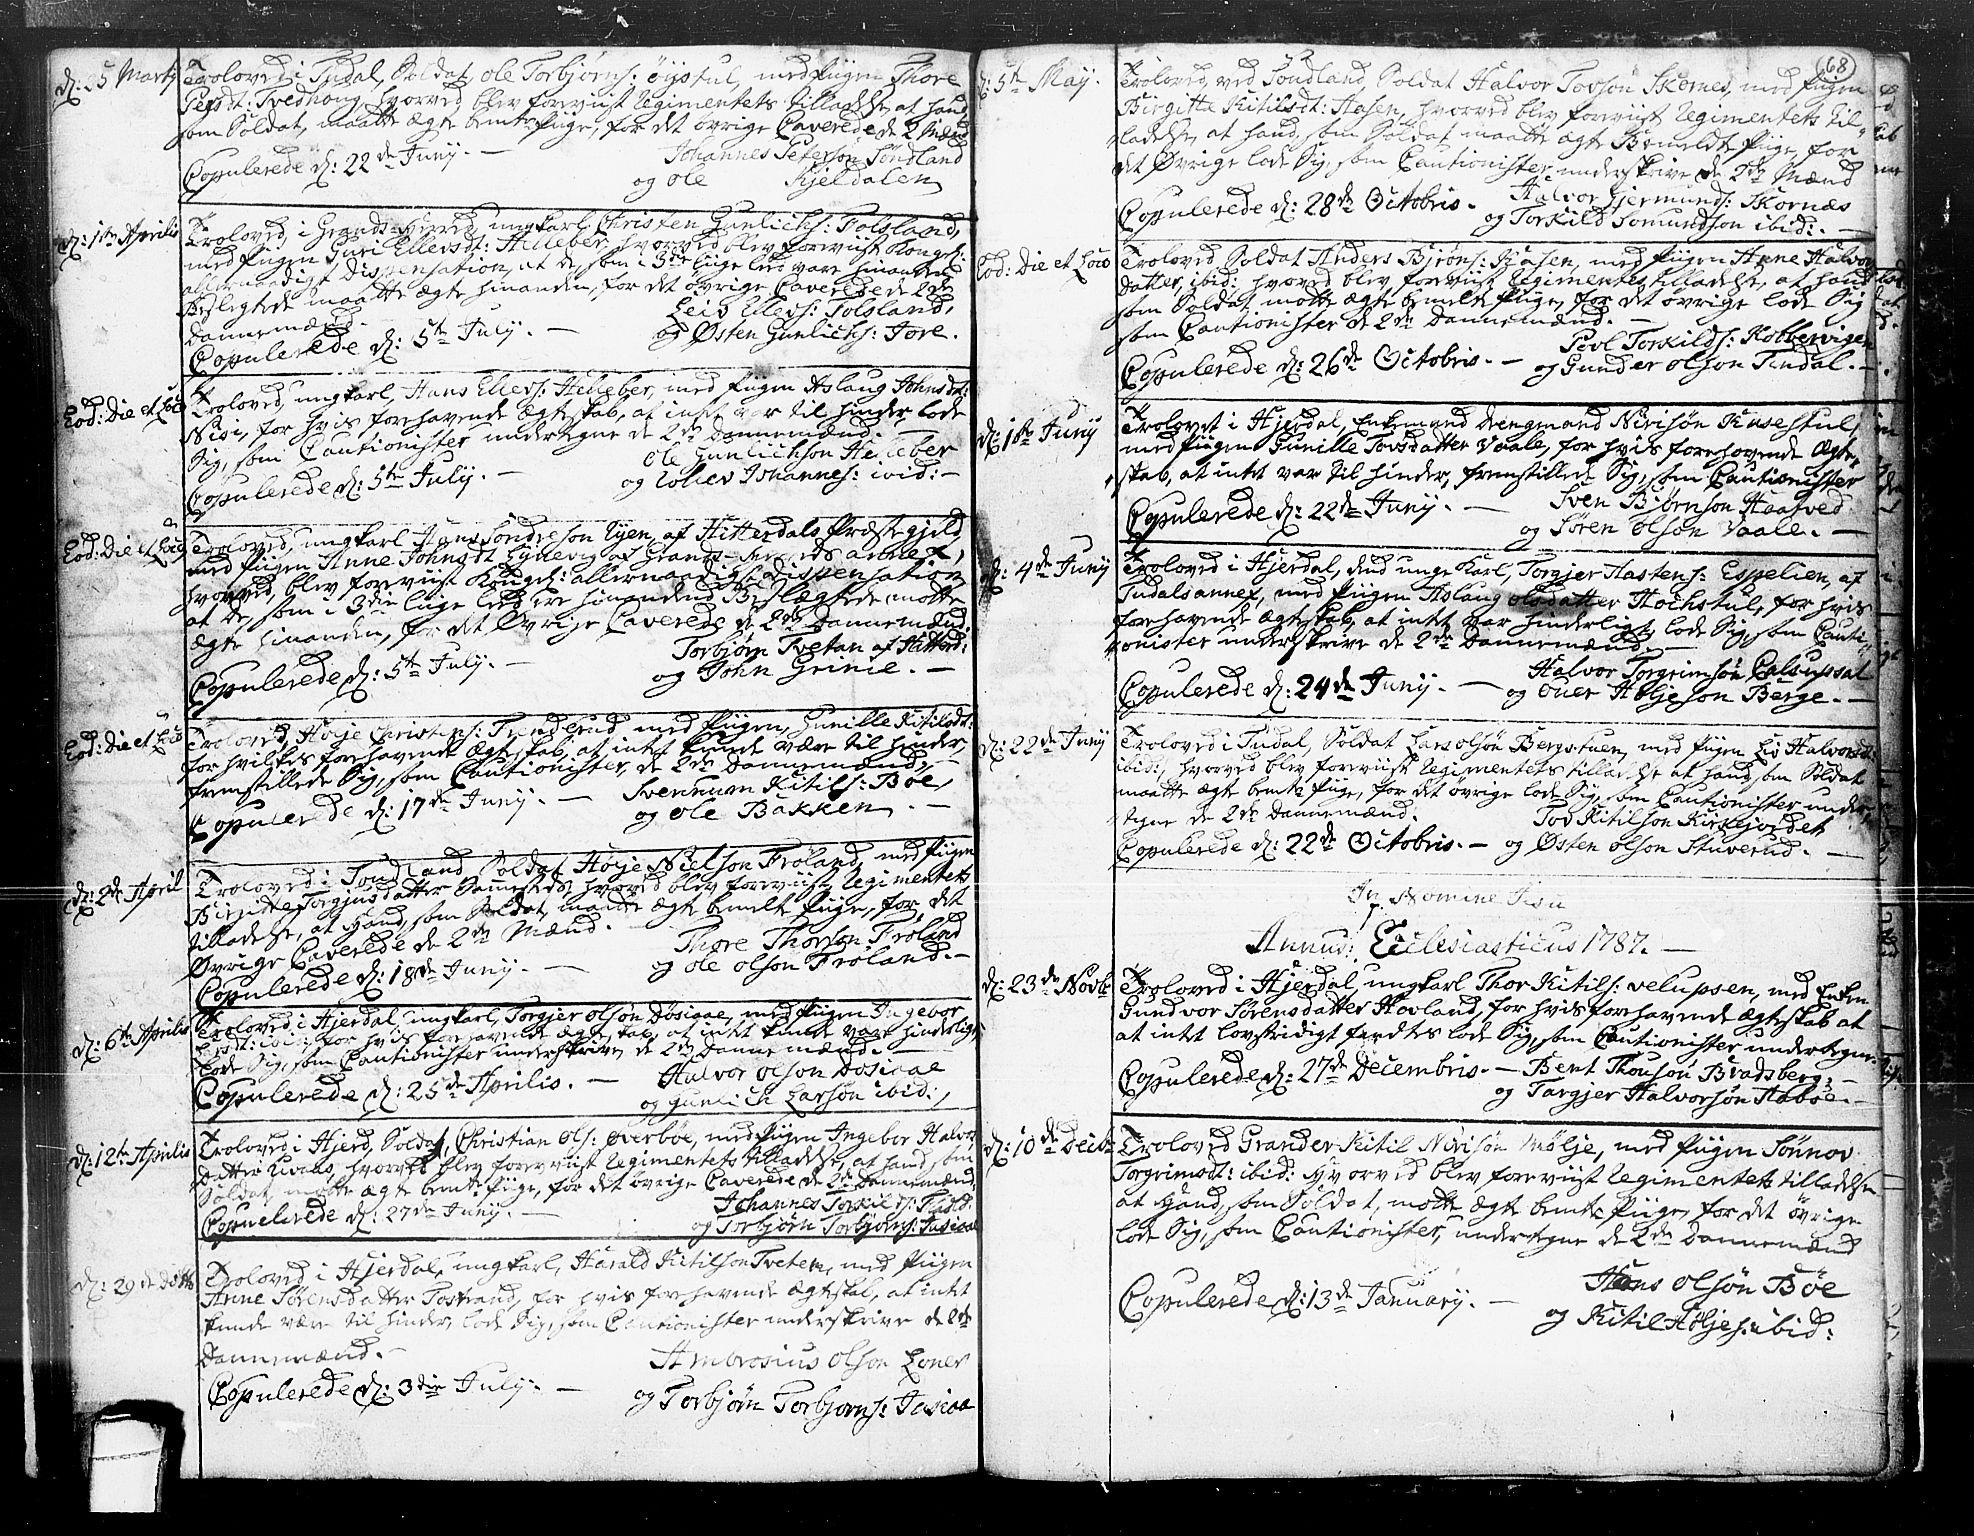 SAKO, Hjartdal kirkebøker, F/Fa/L0004: Ministerialbok nr. I 4, 1727-1795, s. 68